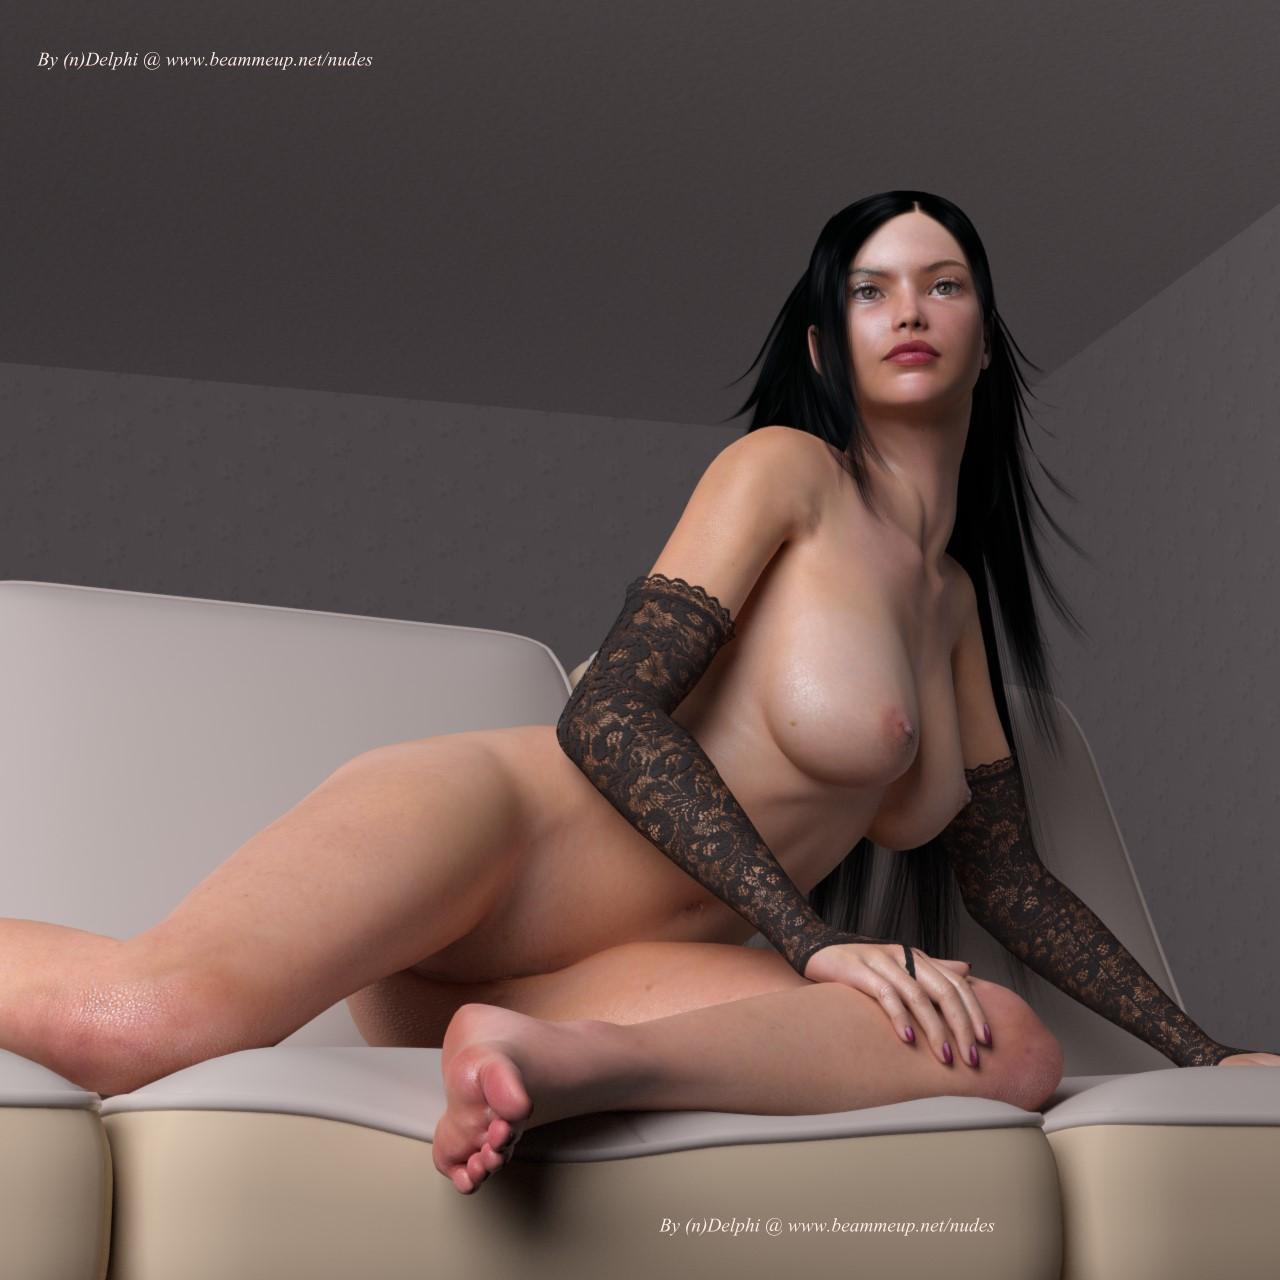 3d cg girls nude